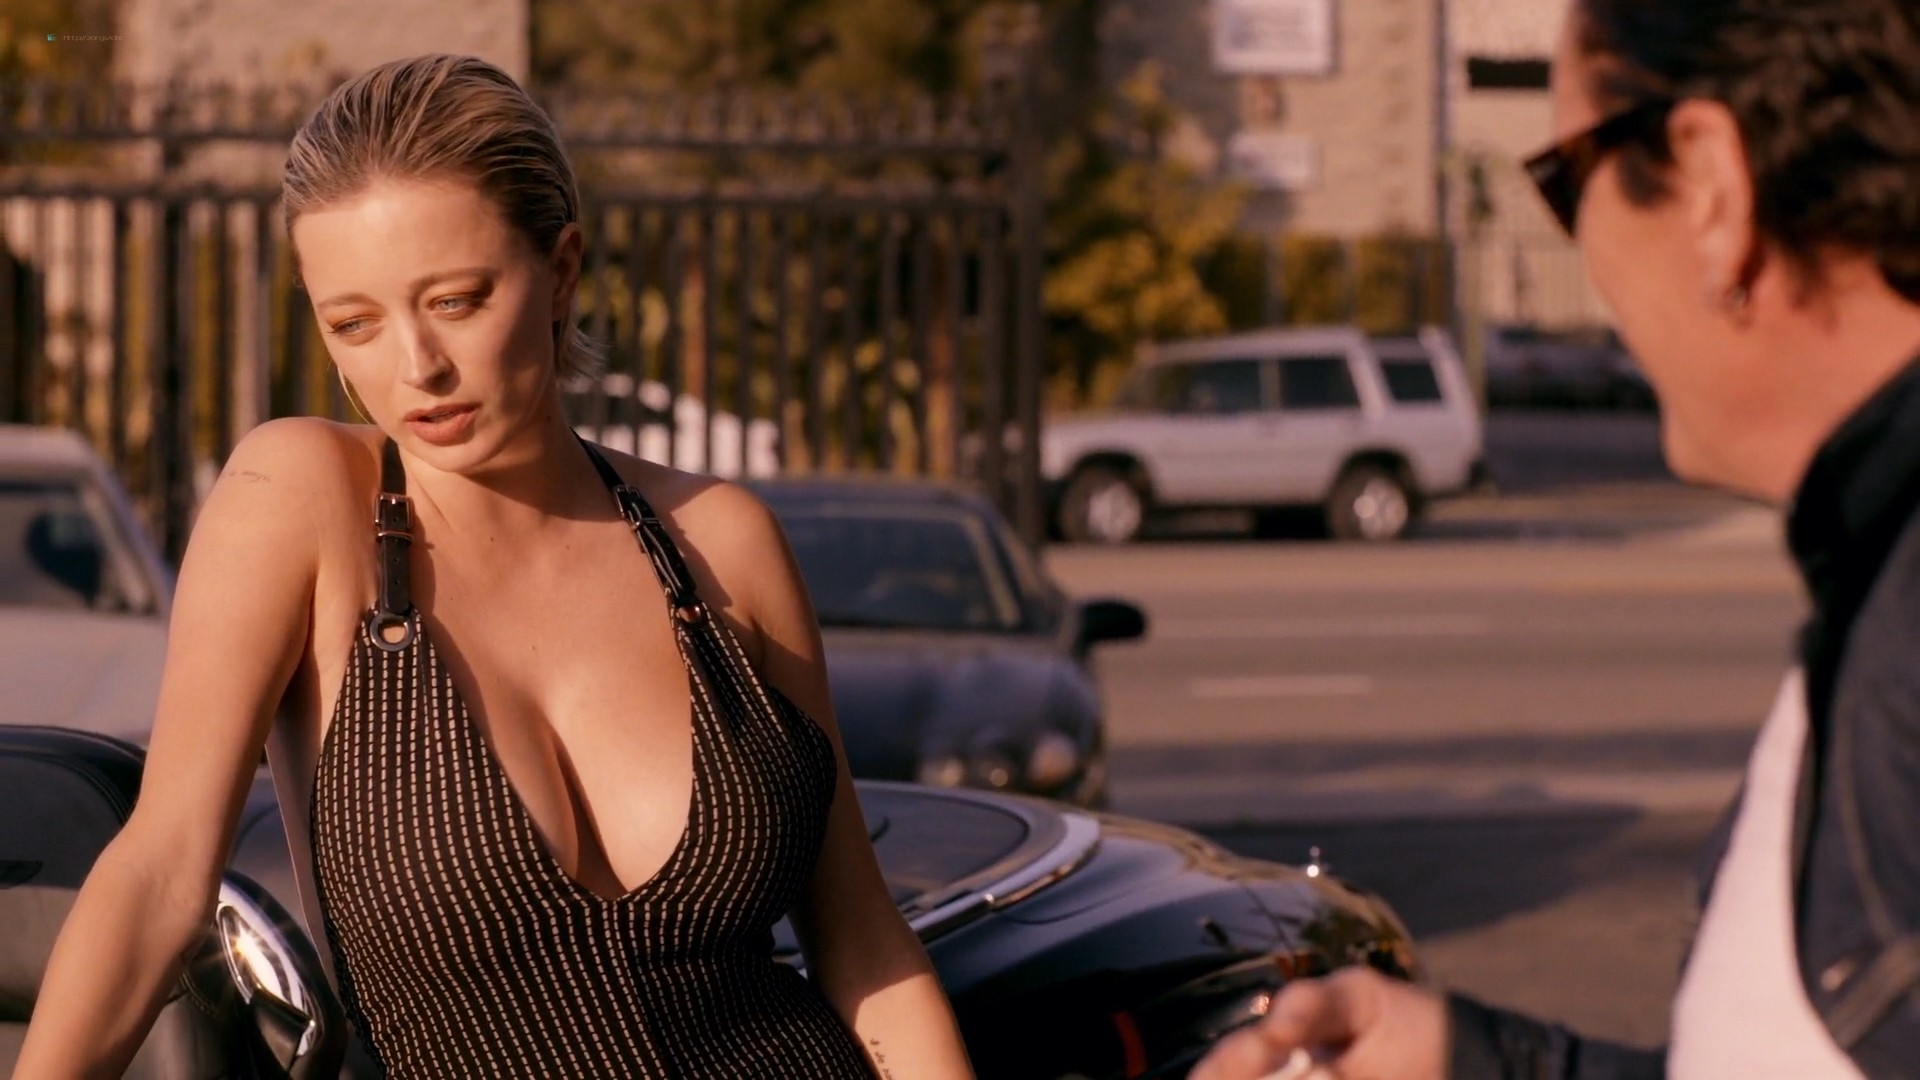 Caroline Vreeland busty see through Zoe Chait, Kenzie Dalton hot - Red Handed (2019) 1080p Web (20)